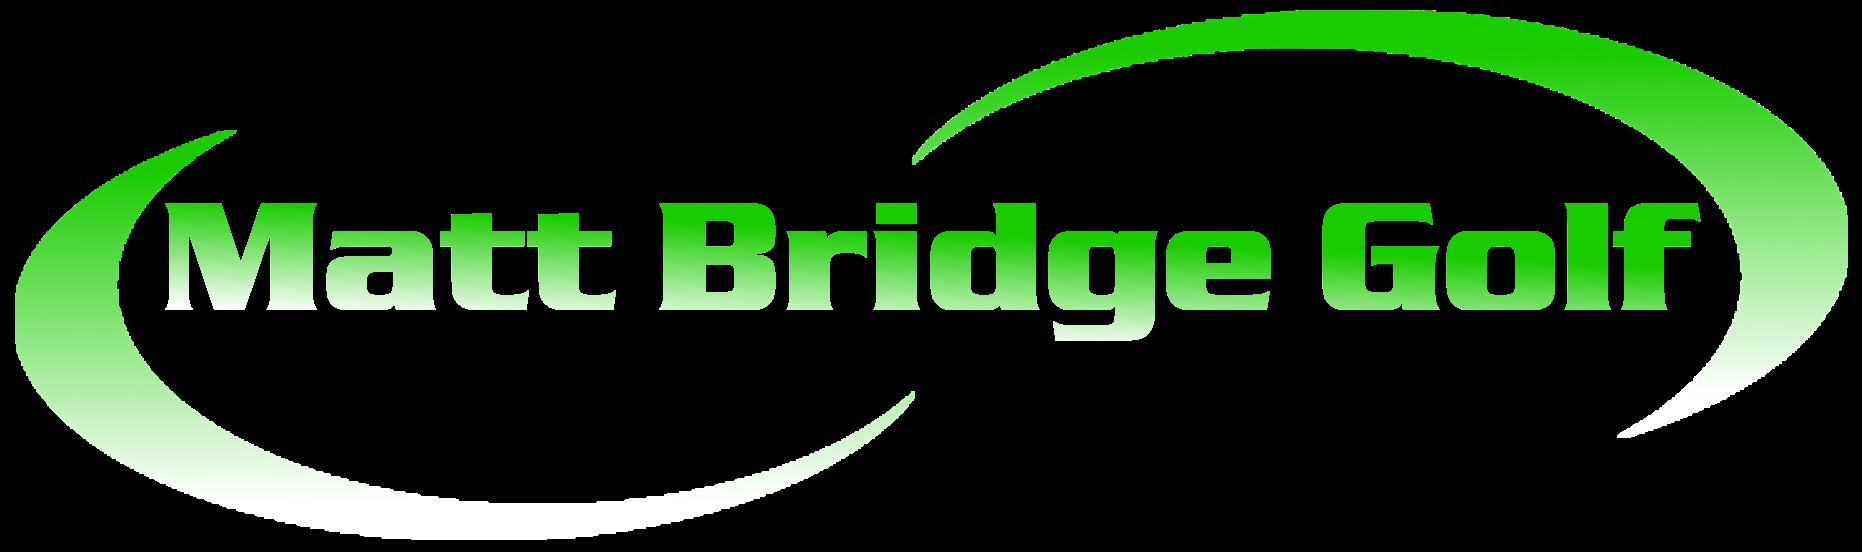 Matt Bridge Golf